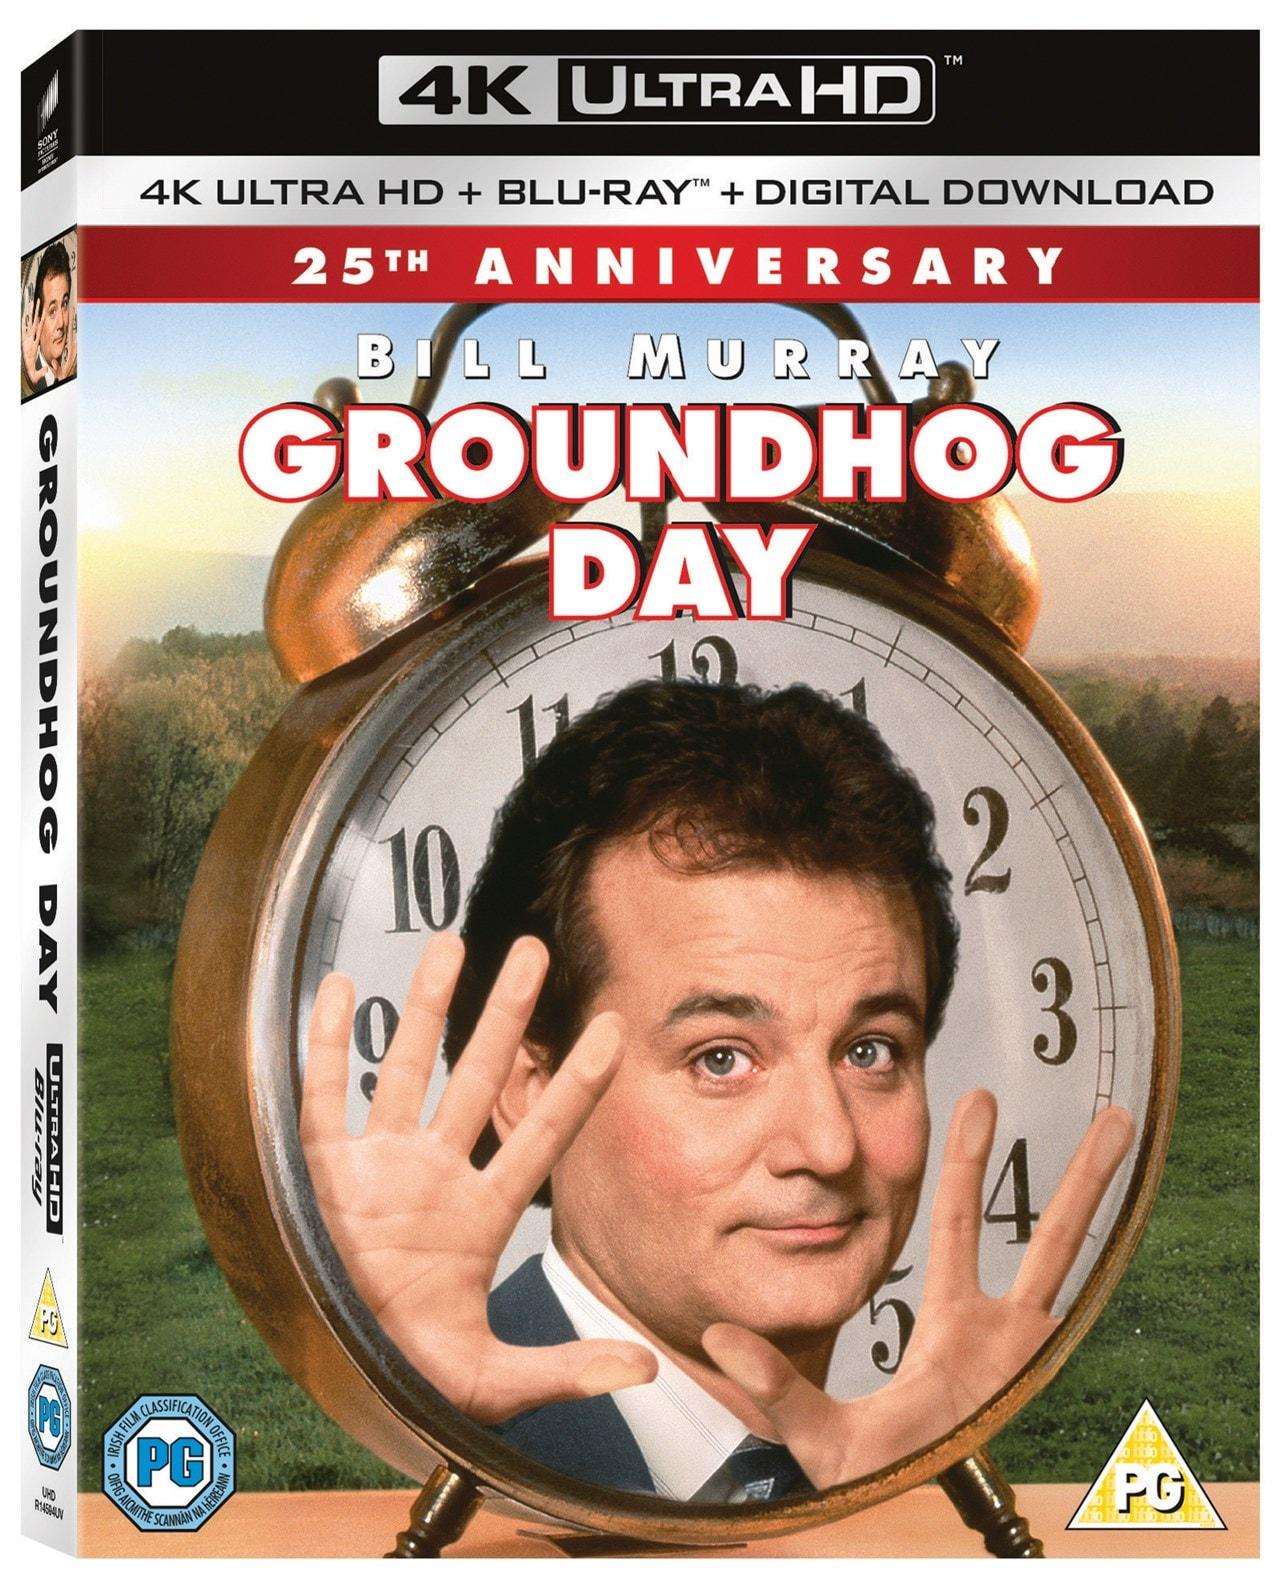 Groundhog Day - 2